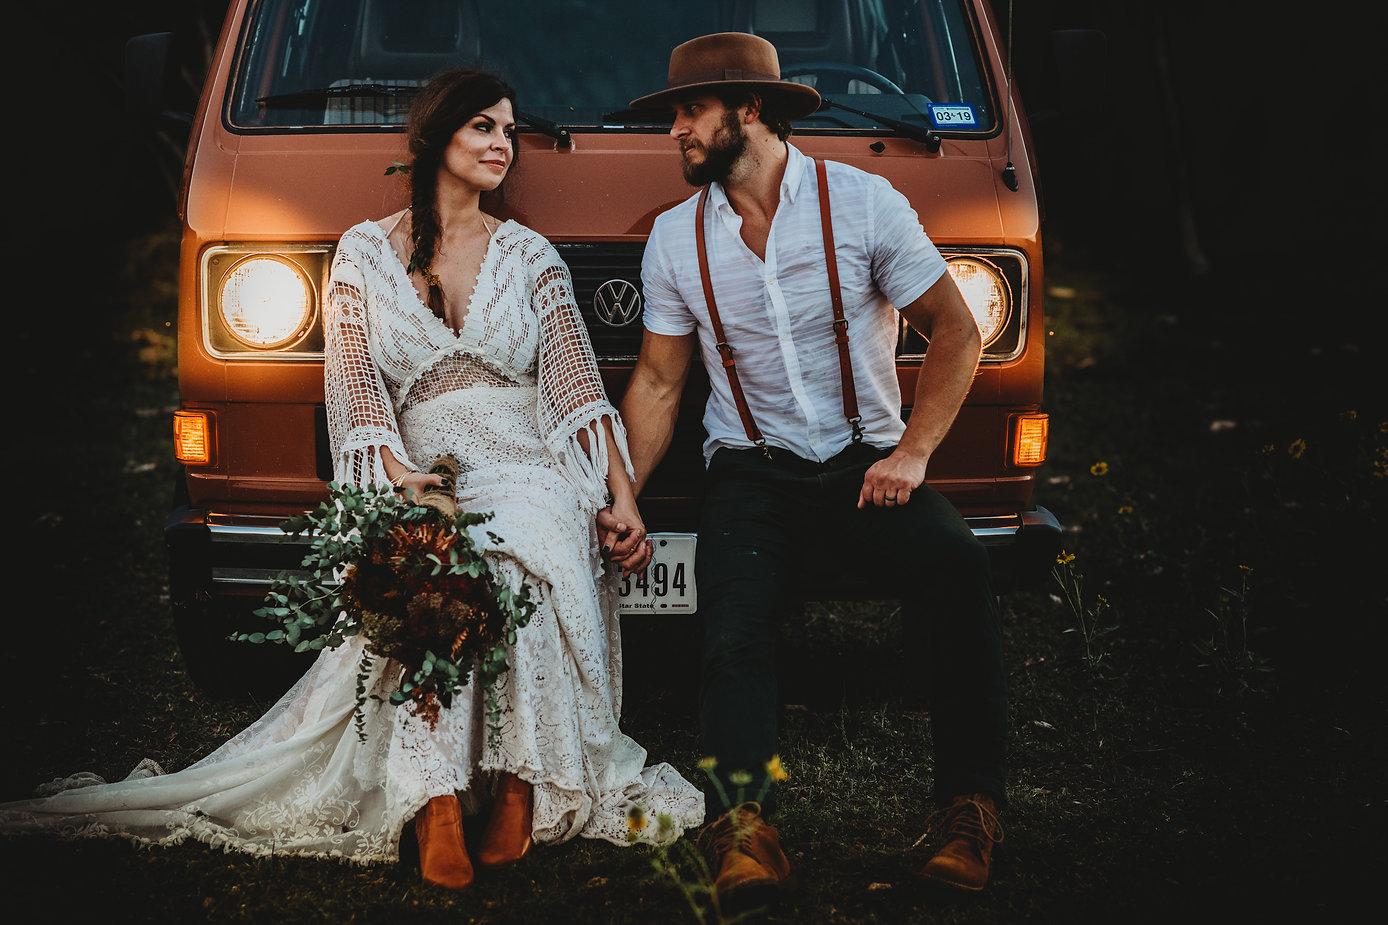 Wedding photographer Newcastle Australia